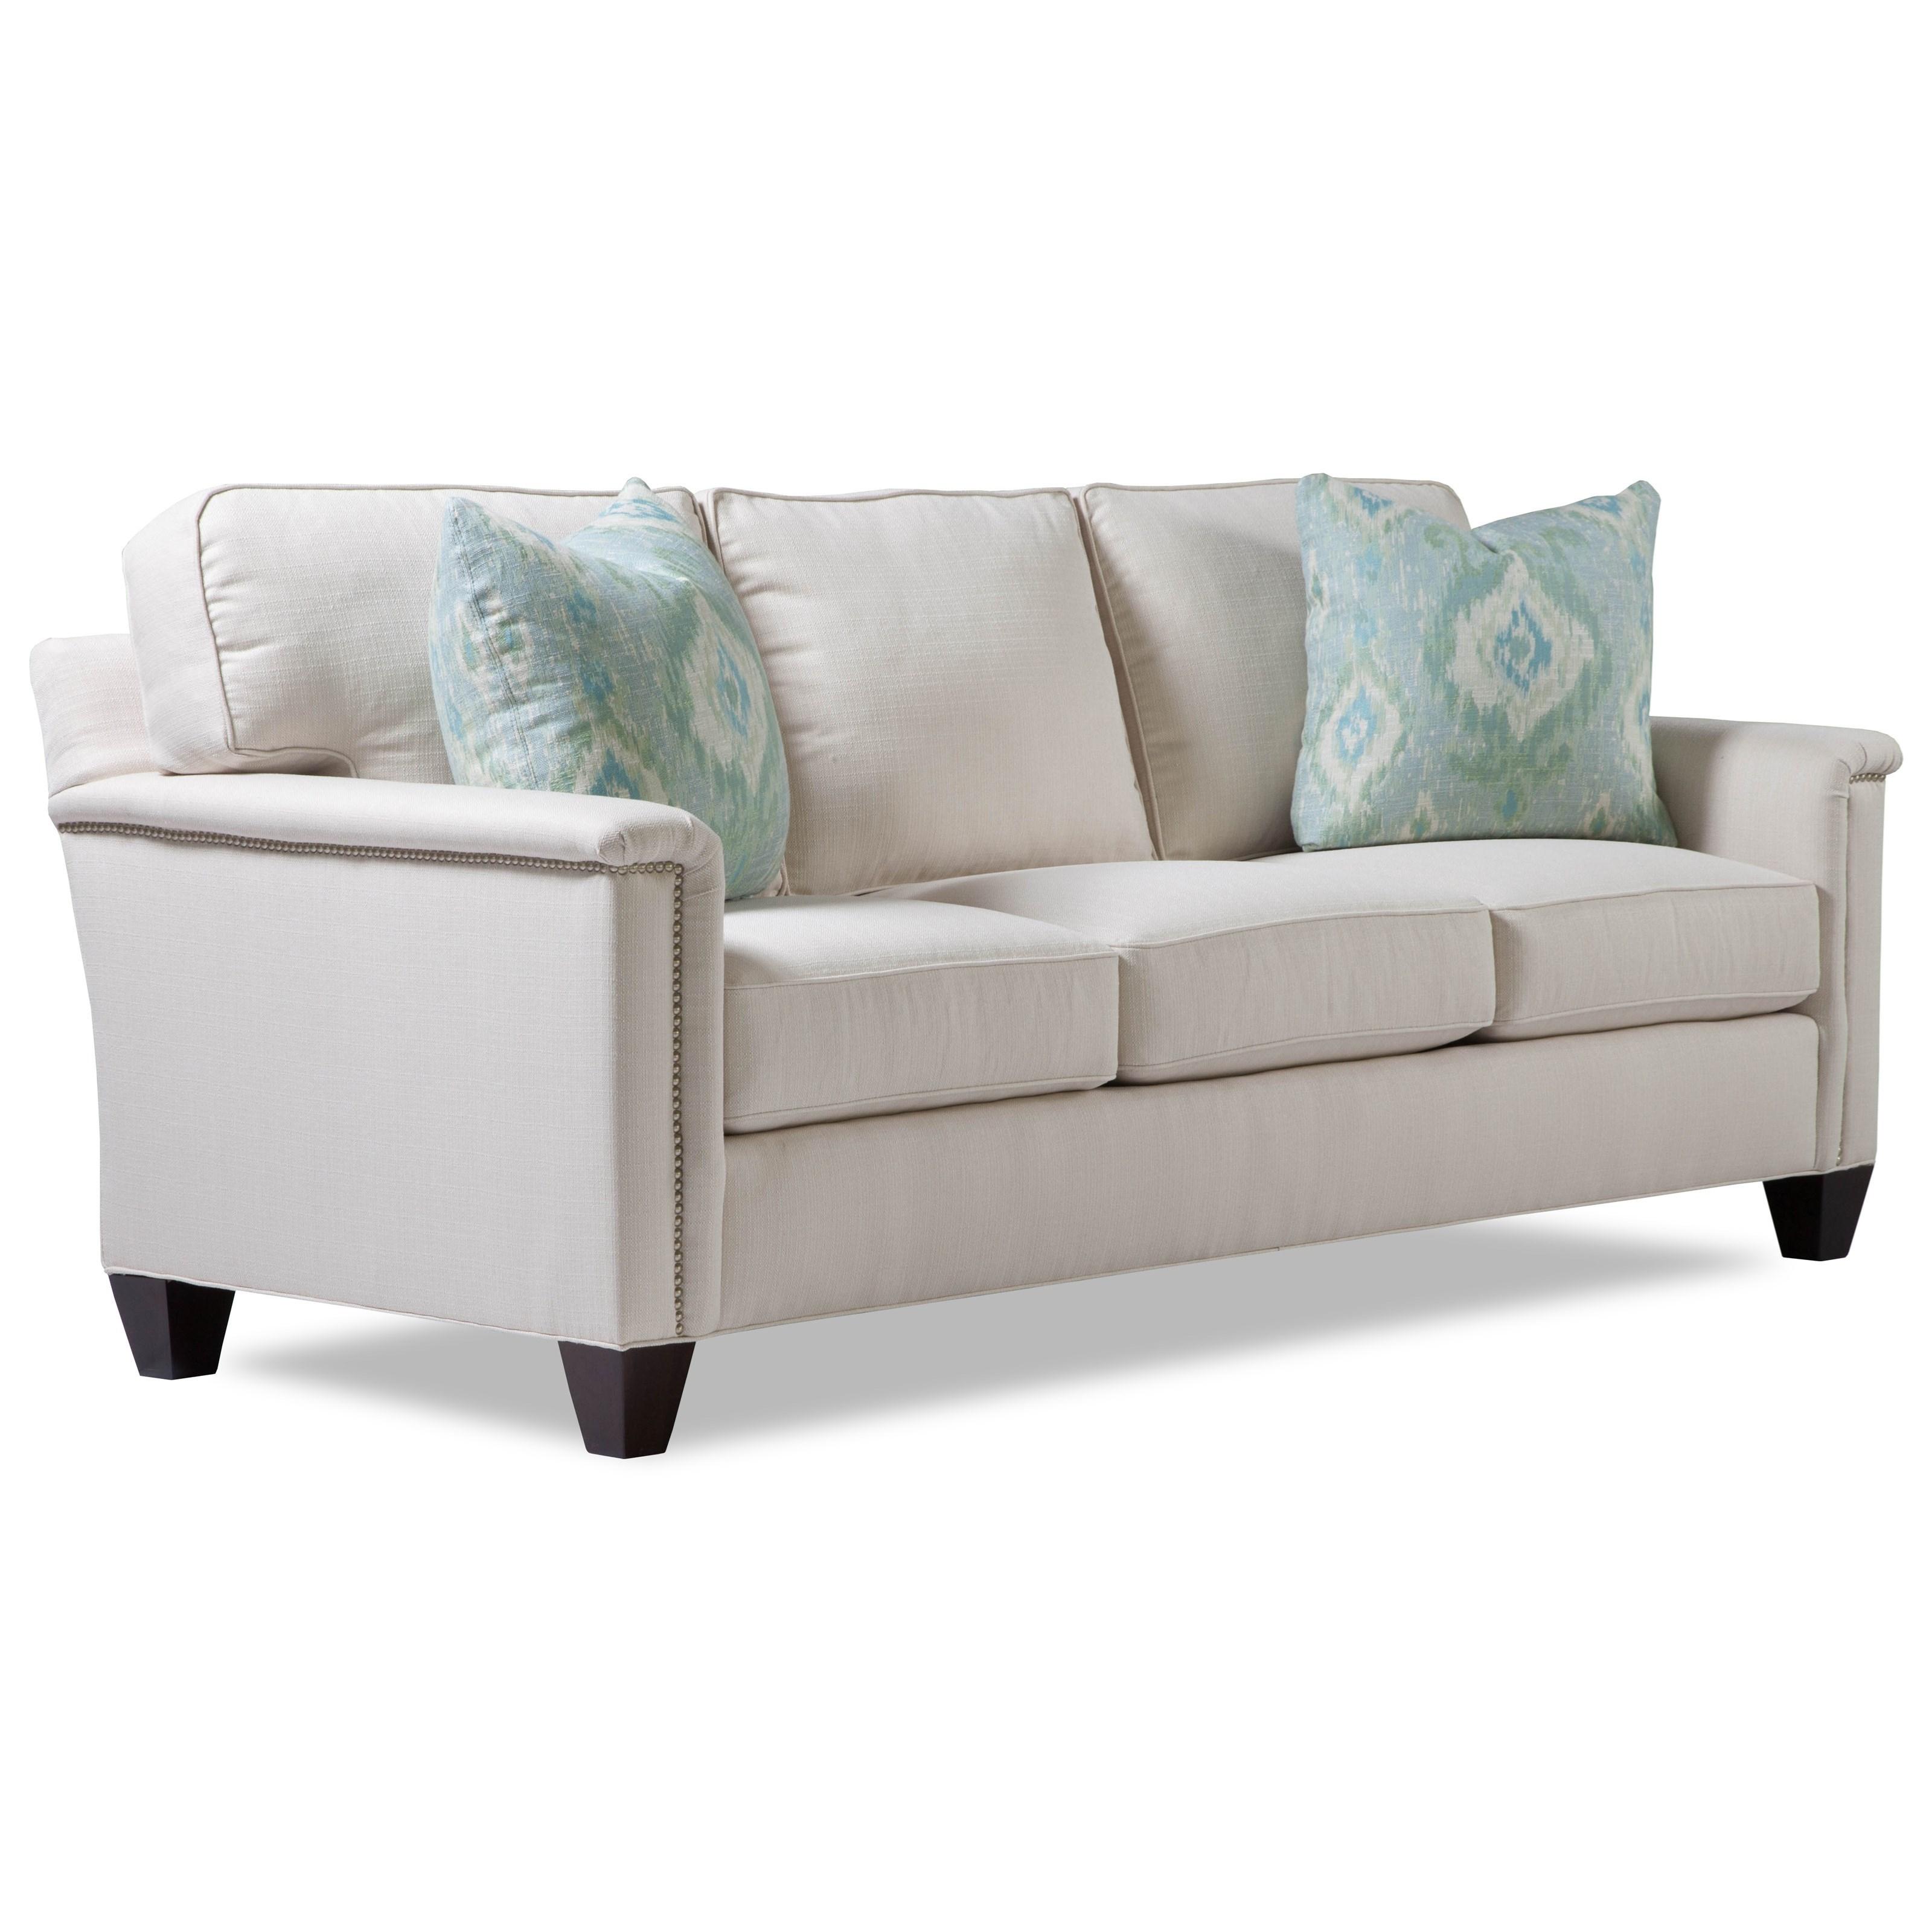 Huntington House 2042 2042 20 Customizable Three Seat Sofa